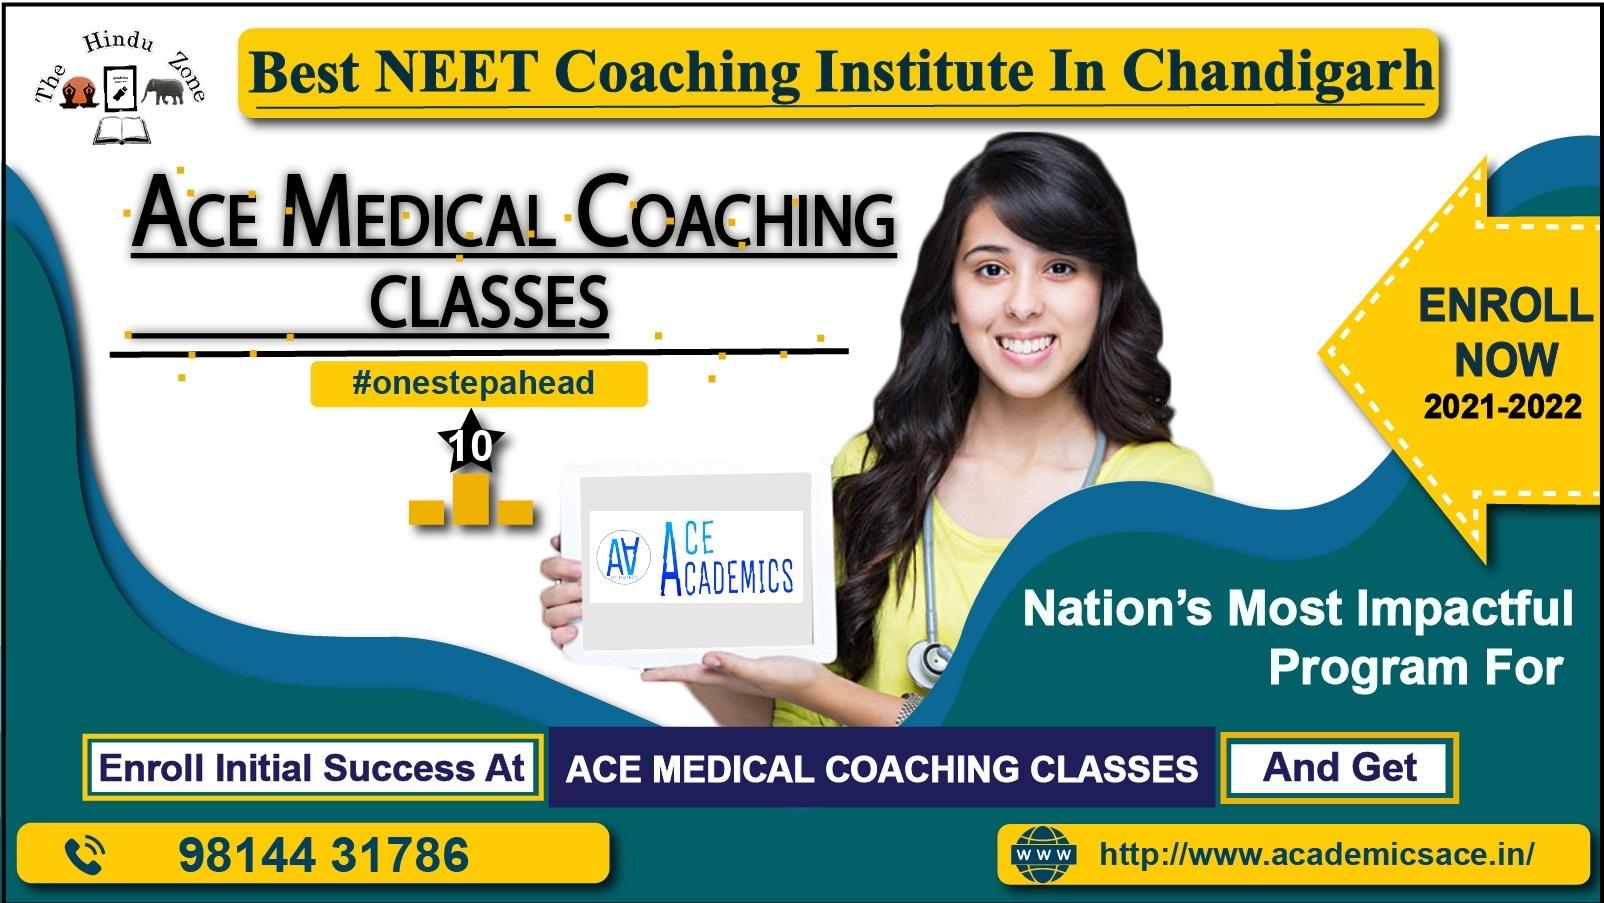 Top NEET Coaching In Chandigarh